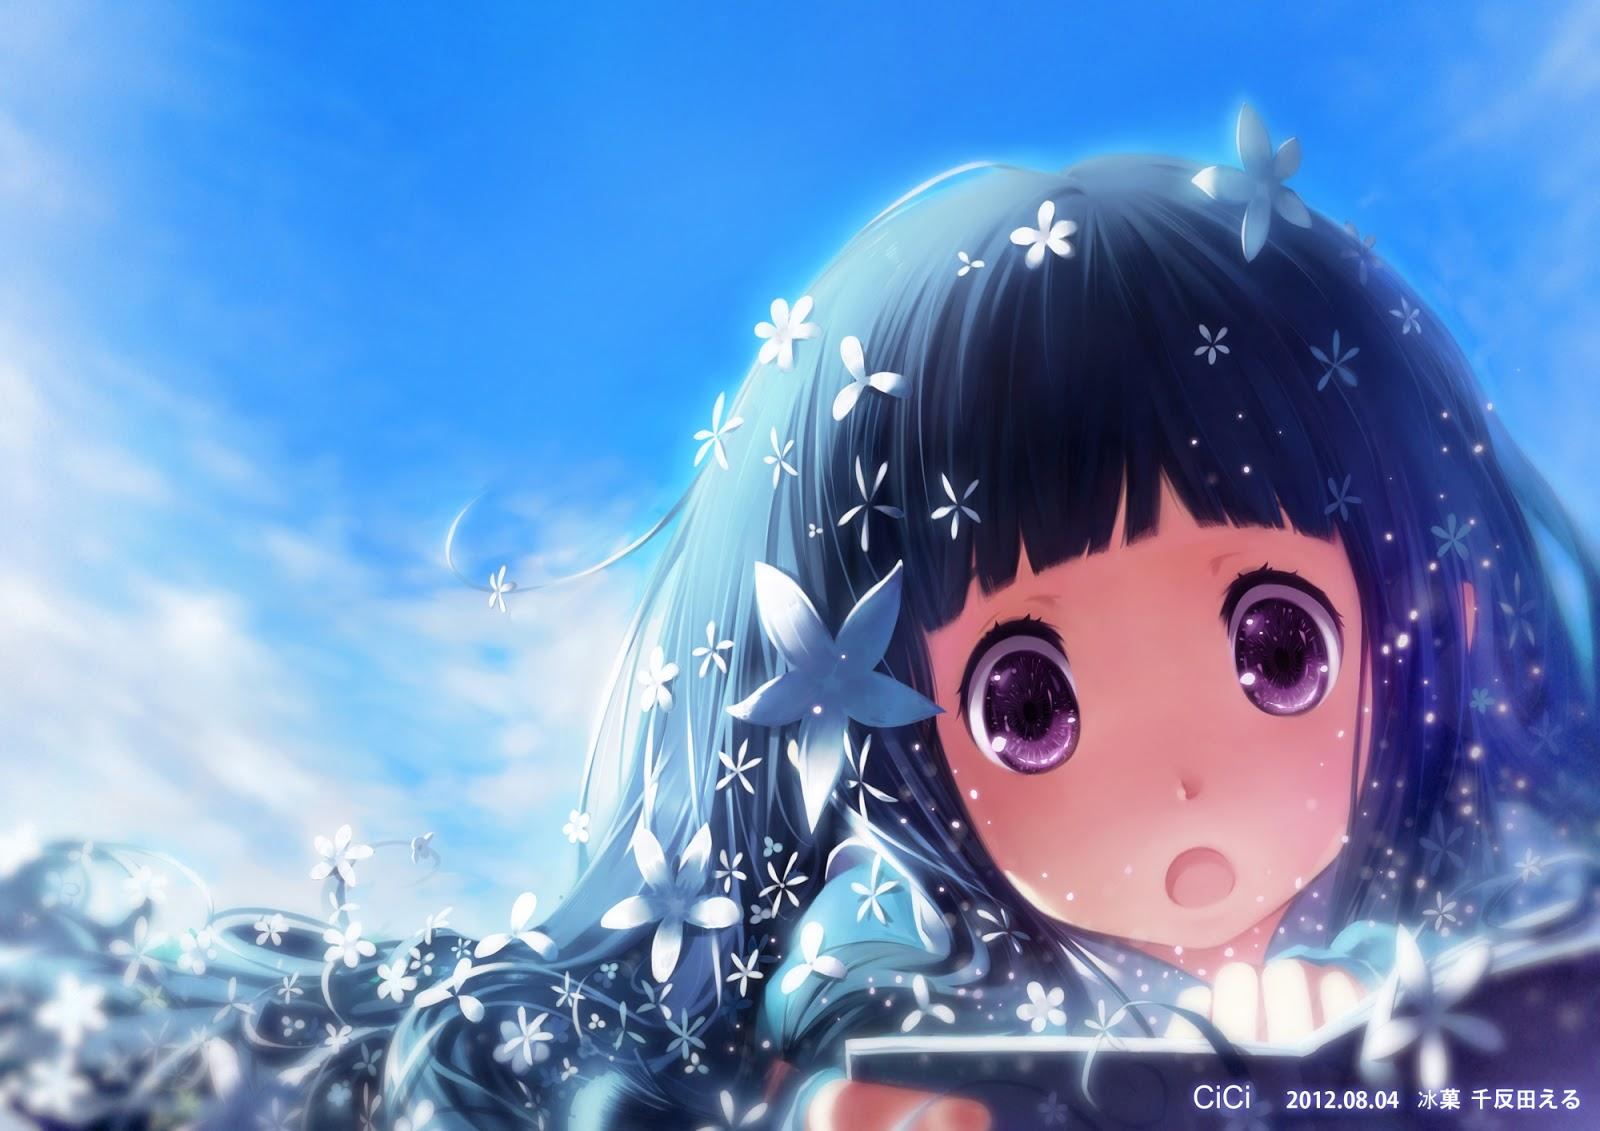 http://1.bp.blogspot.com/-ncwIlj5YAYg/UODnhg4LjWI/AAAAAAAATcY/-YGW7KYaOeY/s1600/animekida.com+picturesChitanda.Eru+blue+haired+anime+girl+cutie+5+stars+phistars.jpg